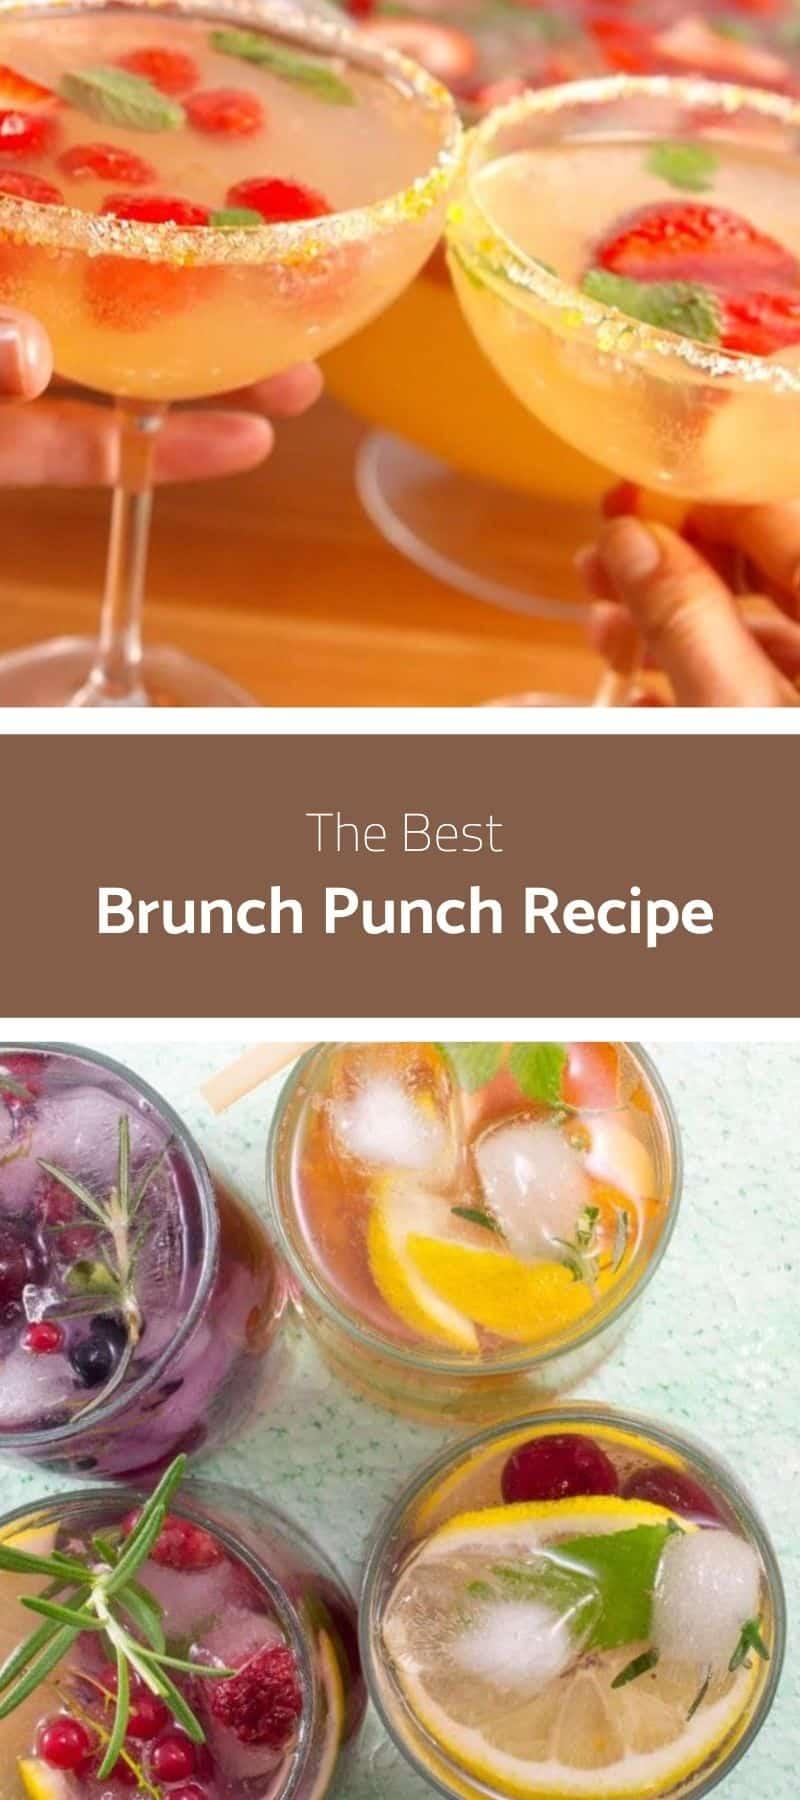 Best Brunch Punch Recipe